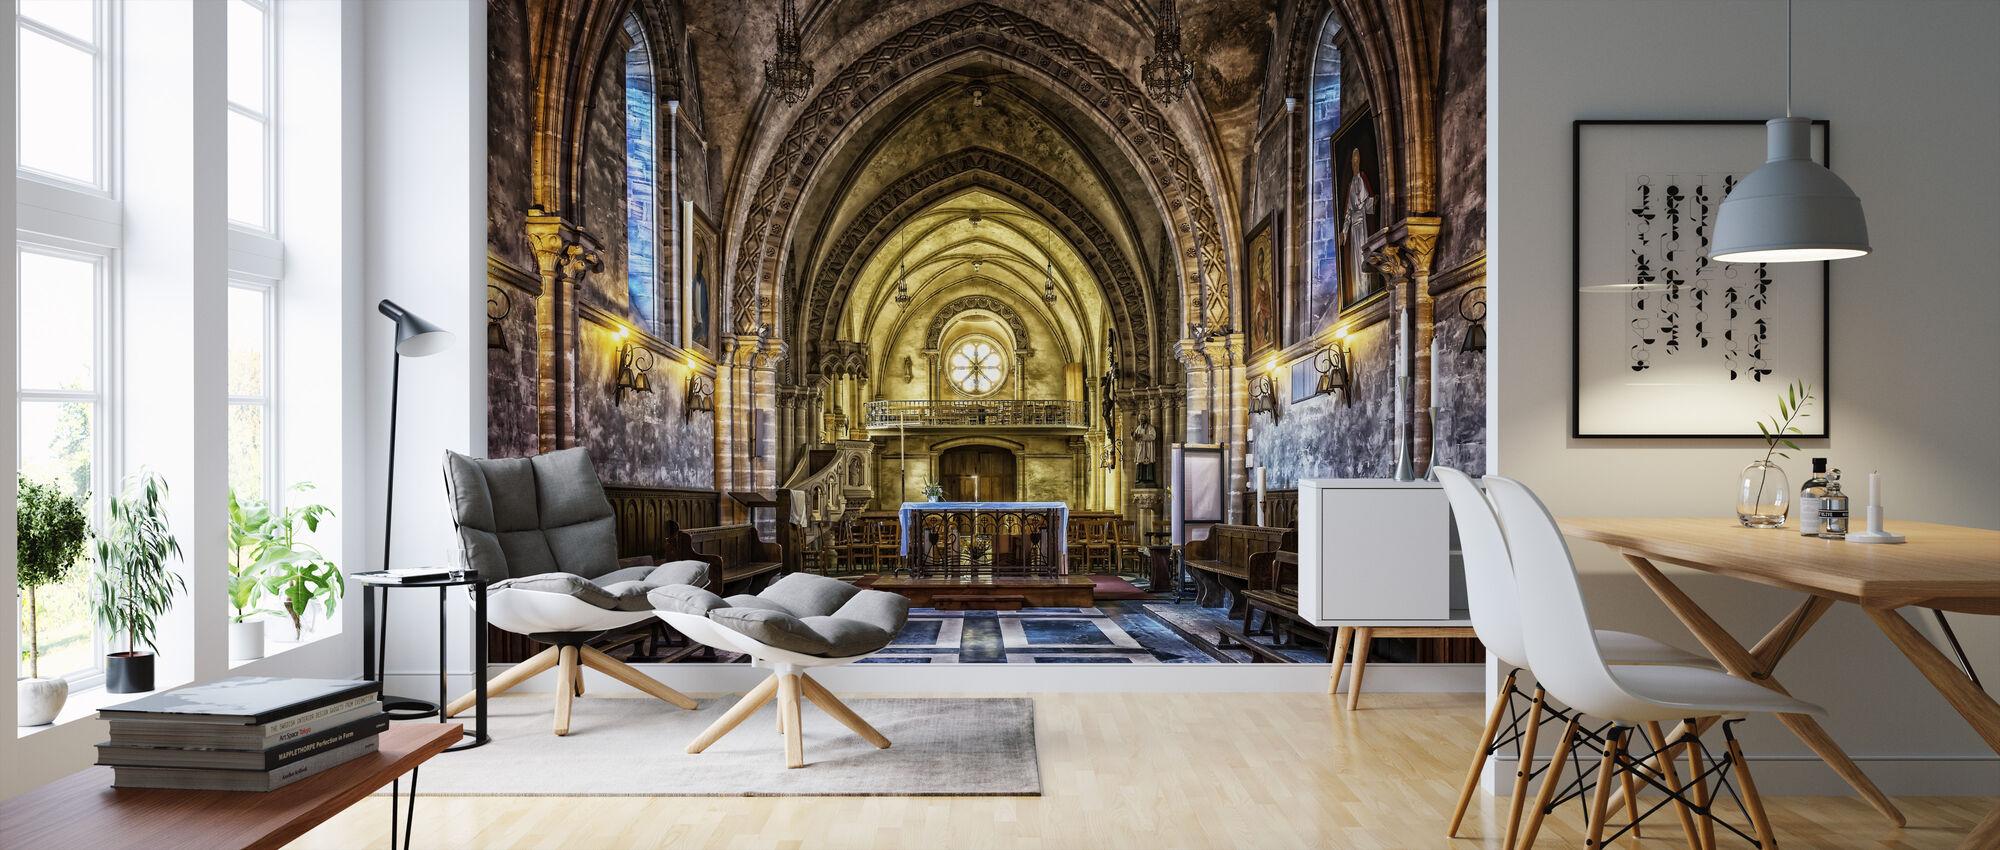 dom church fototapete nach ma photowall. Black Bedroom Furniture Sets. Home Design Ideas